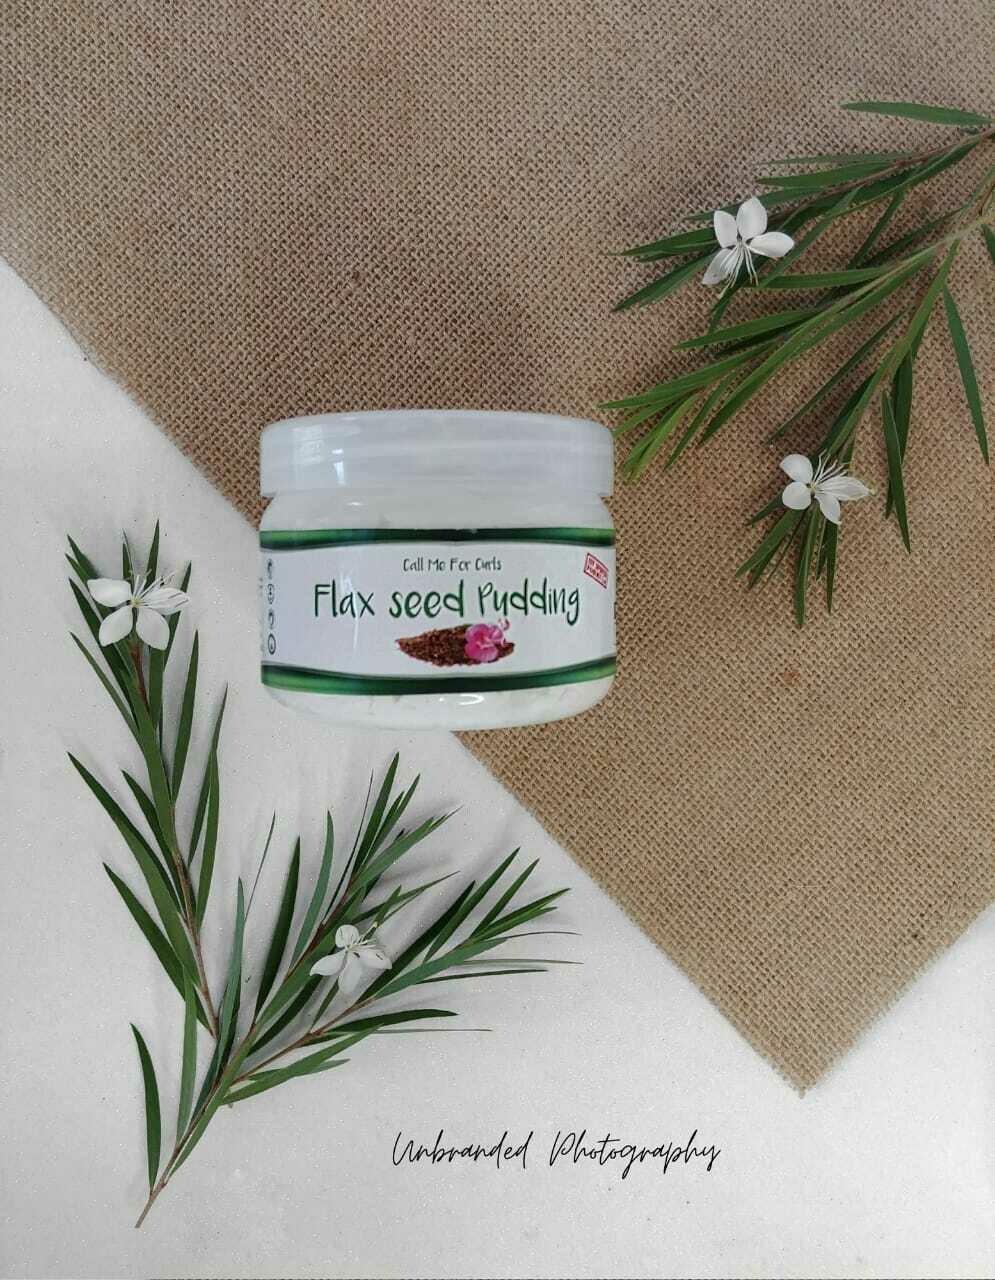 Flax Seed Pudding